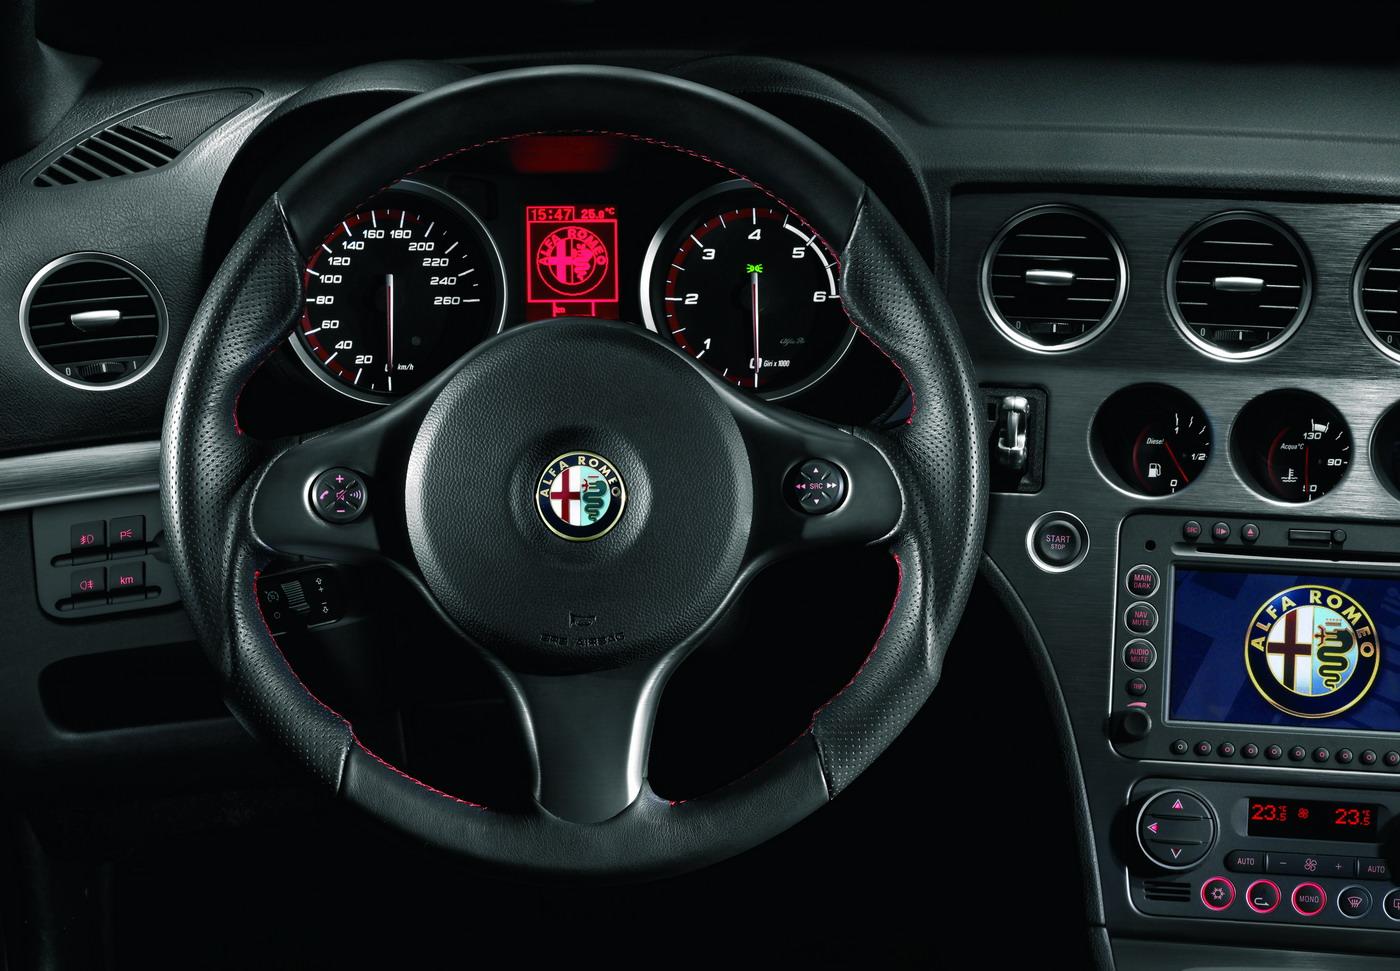 Alfa Romeo 159 Wonderful Imagini - Alfa Romeo